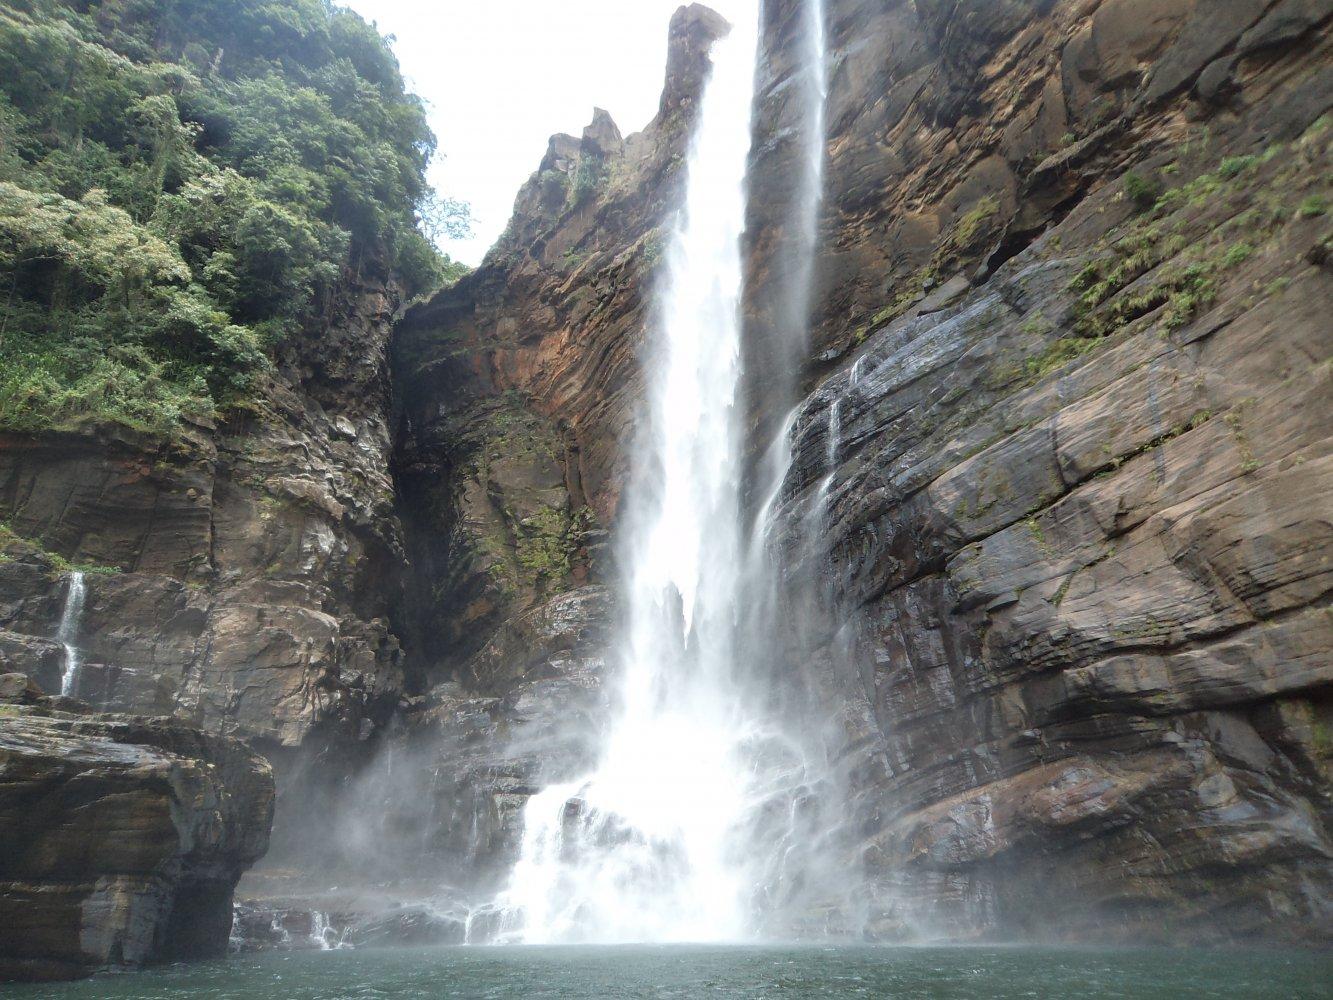 Фото Водопад Лаксапана, Шри-Ланка. Шри-Ланка, Центральная провинция, Norton - Maskeliya Road